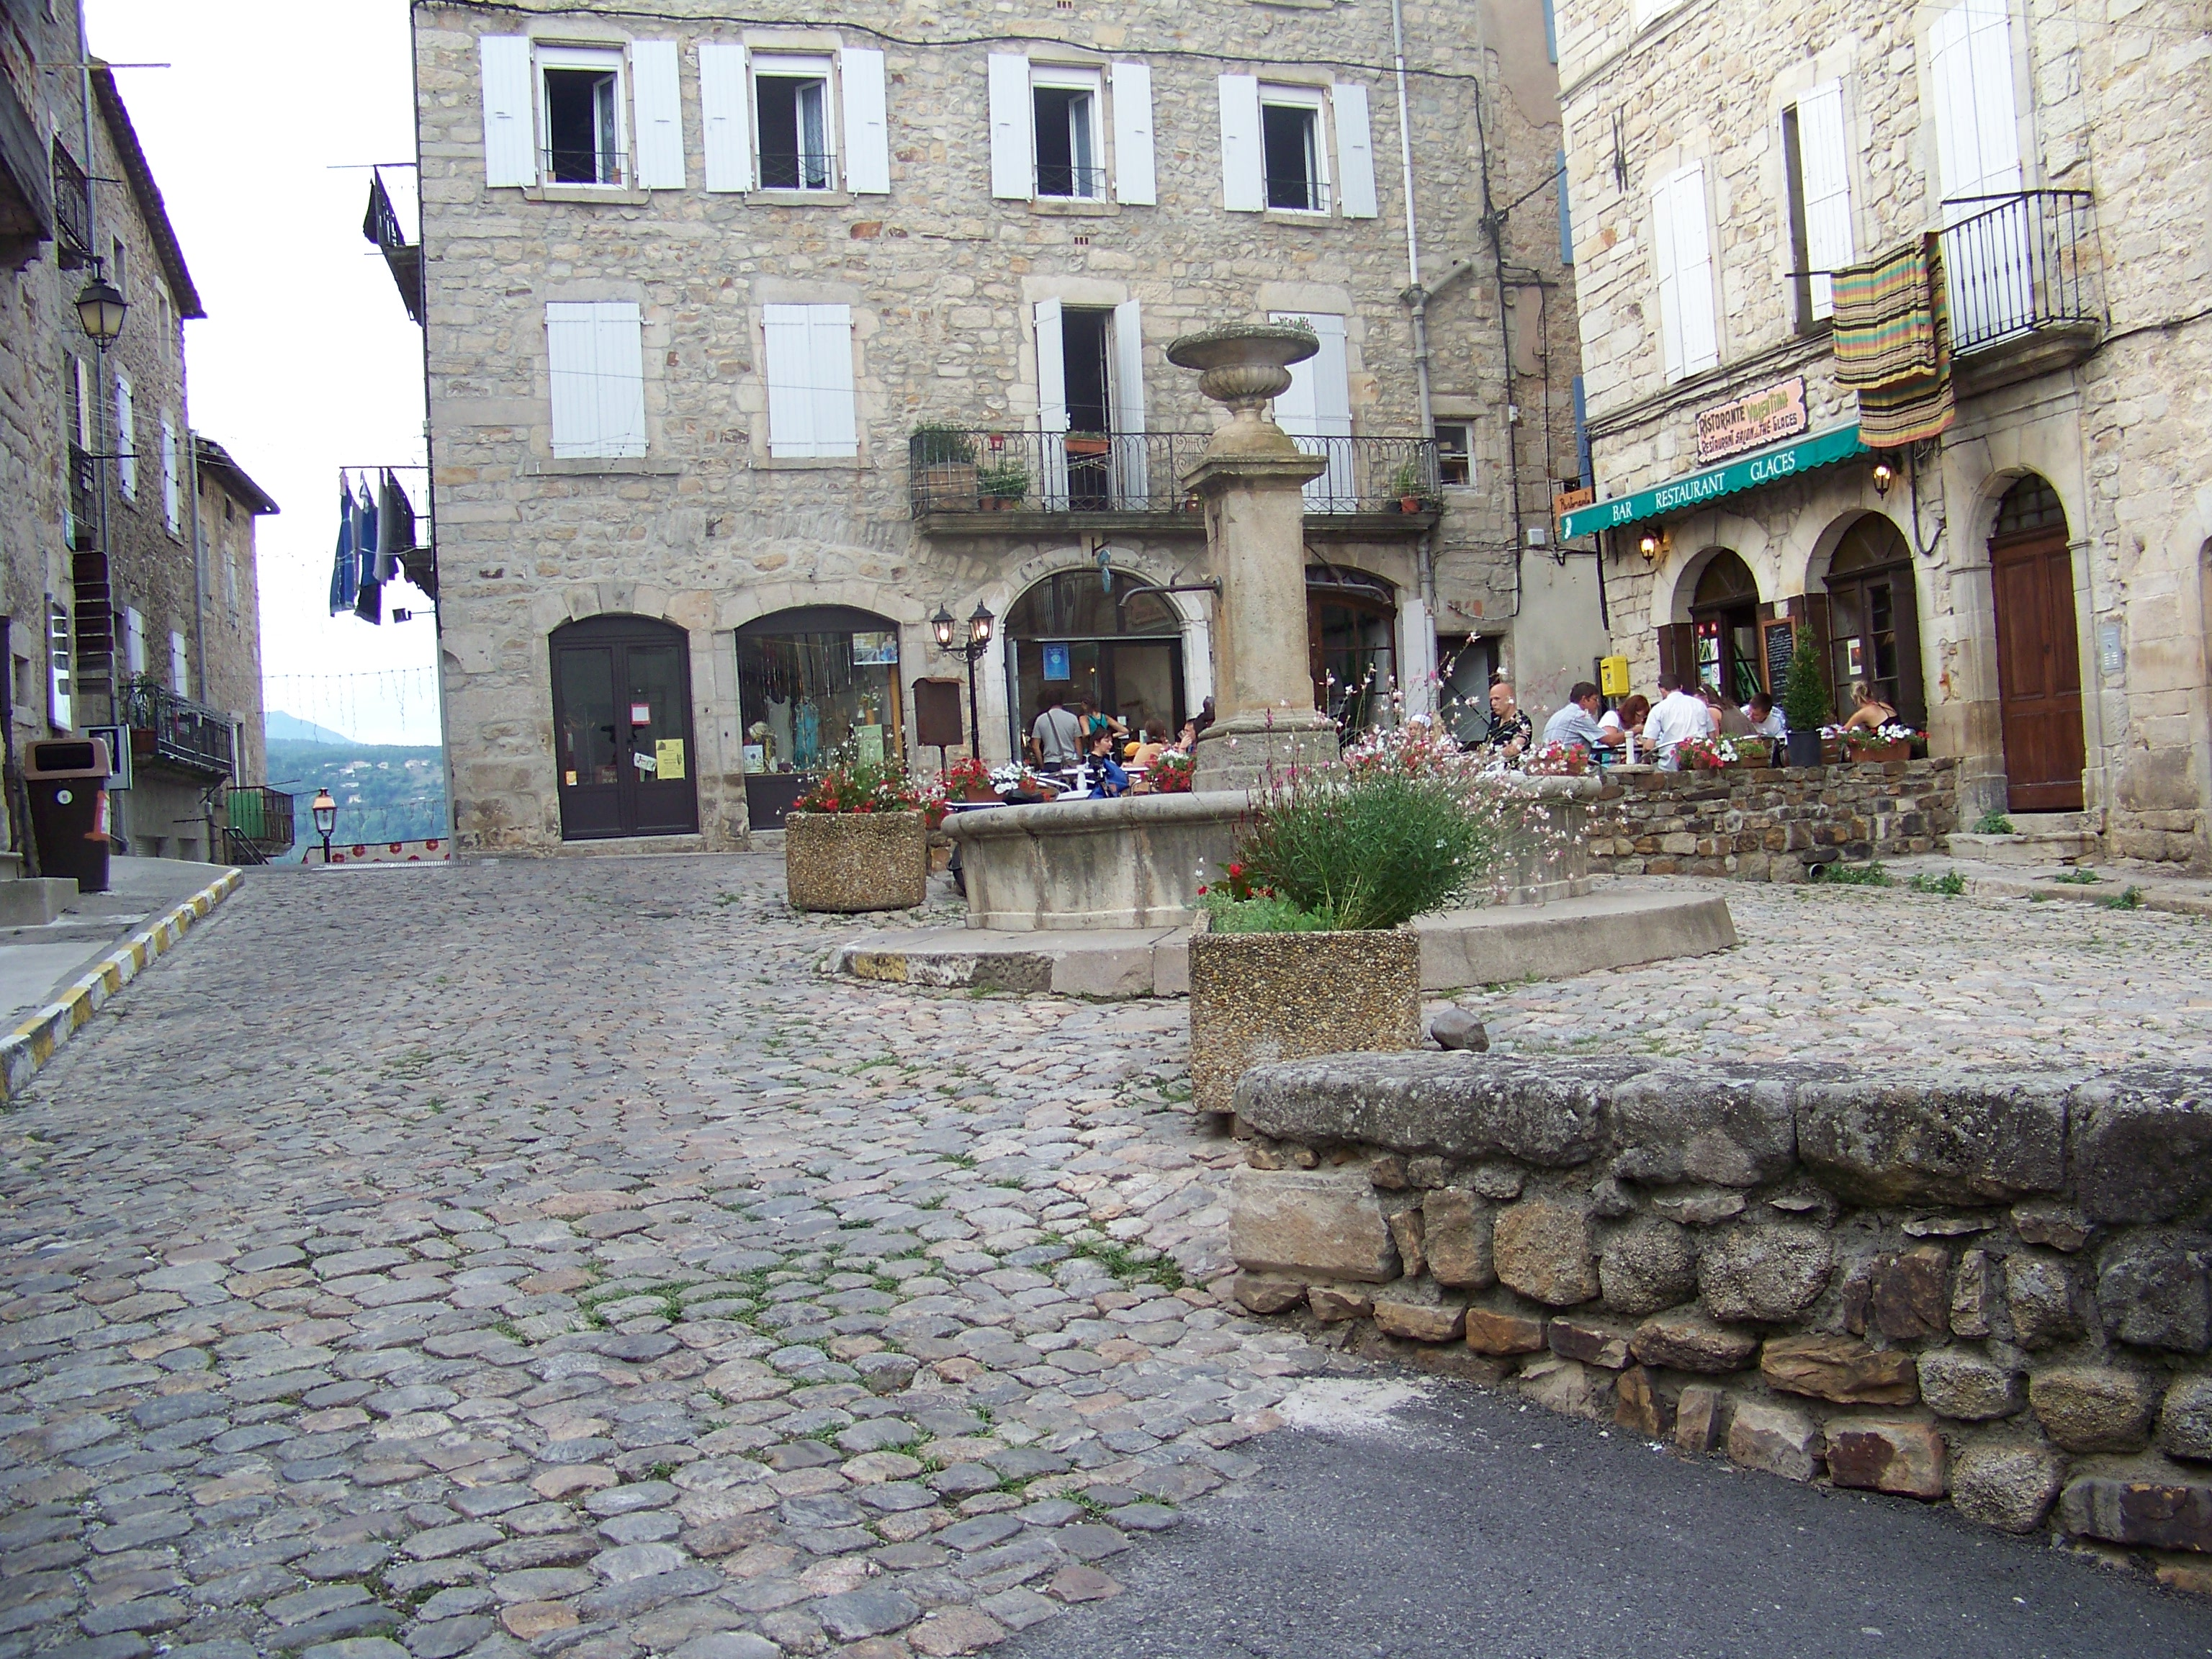 File:Place de la Peyre à Joyeuse.JPG - Wikimedia Commons